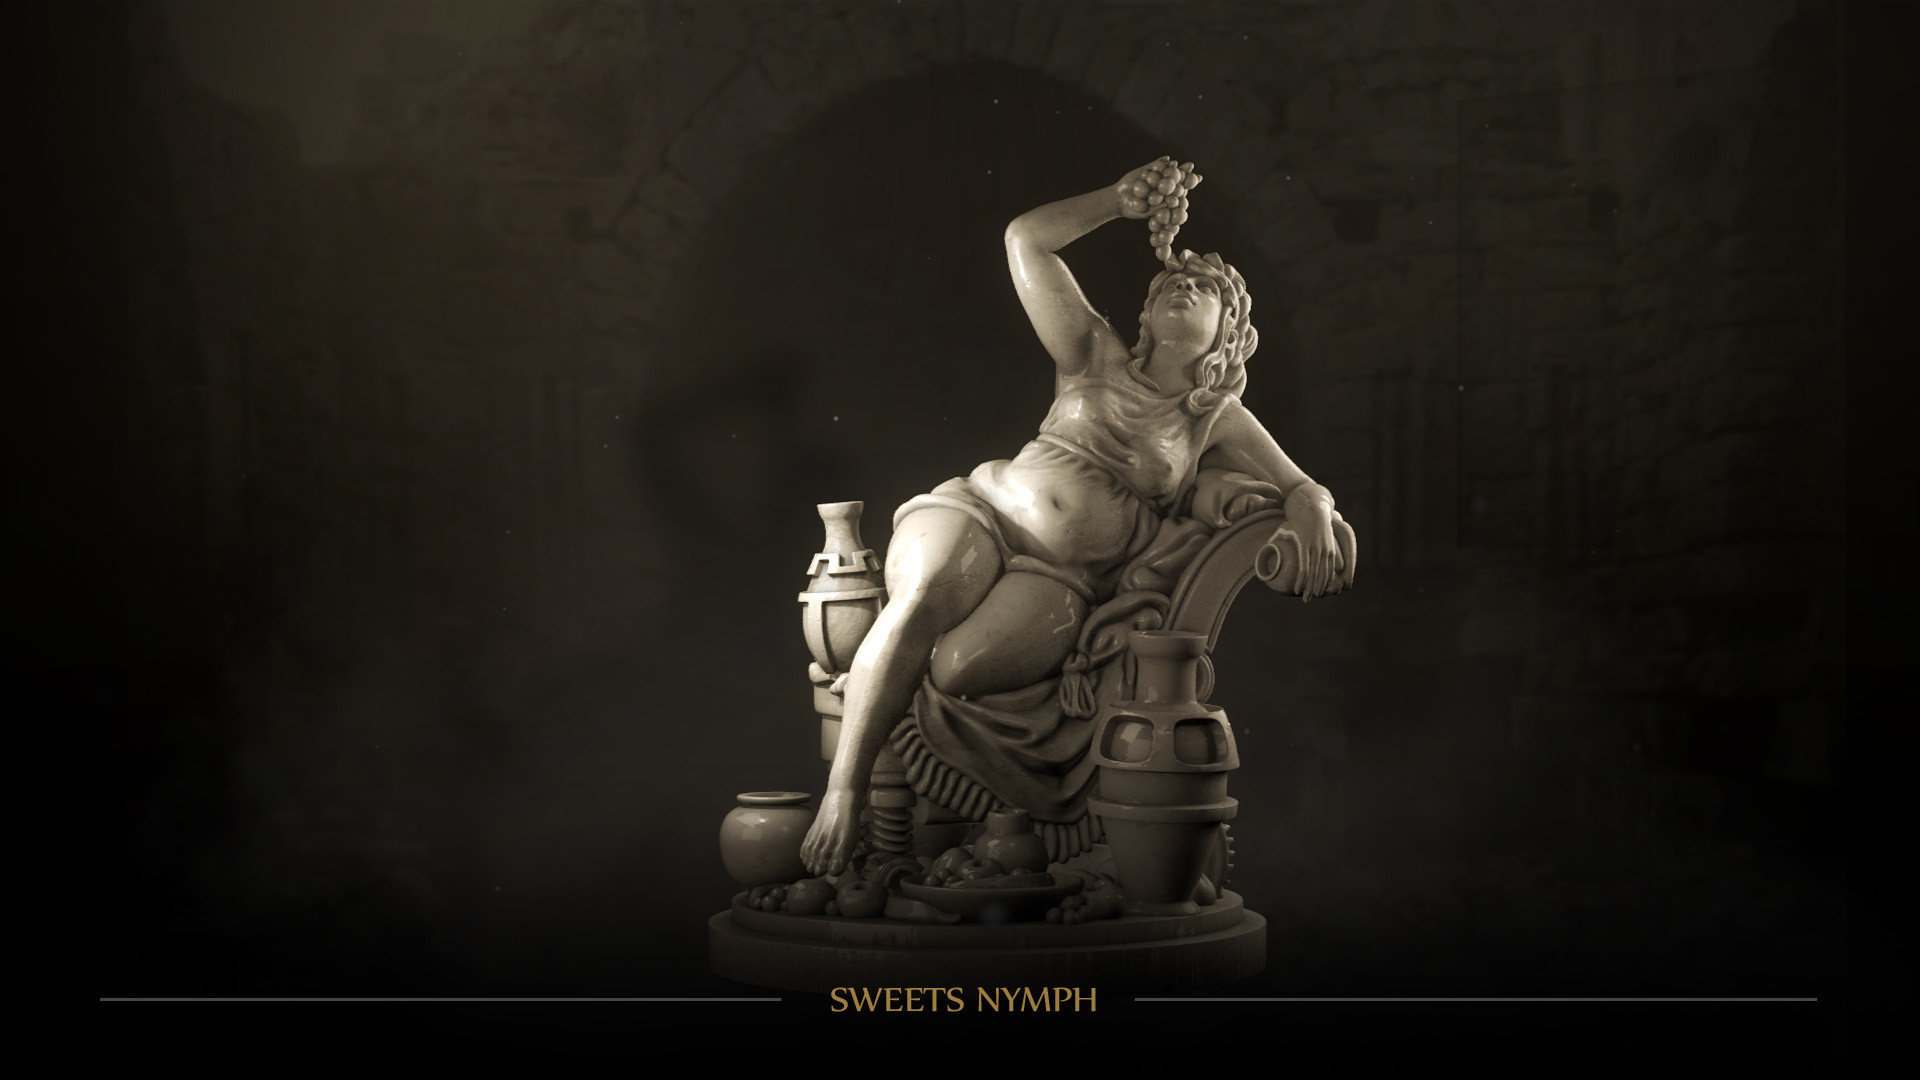 Mateusz lenart sweets nymph turn 200